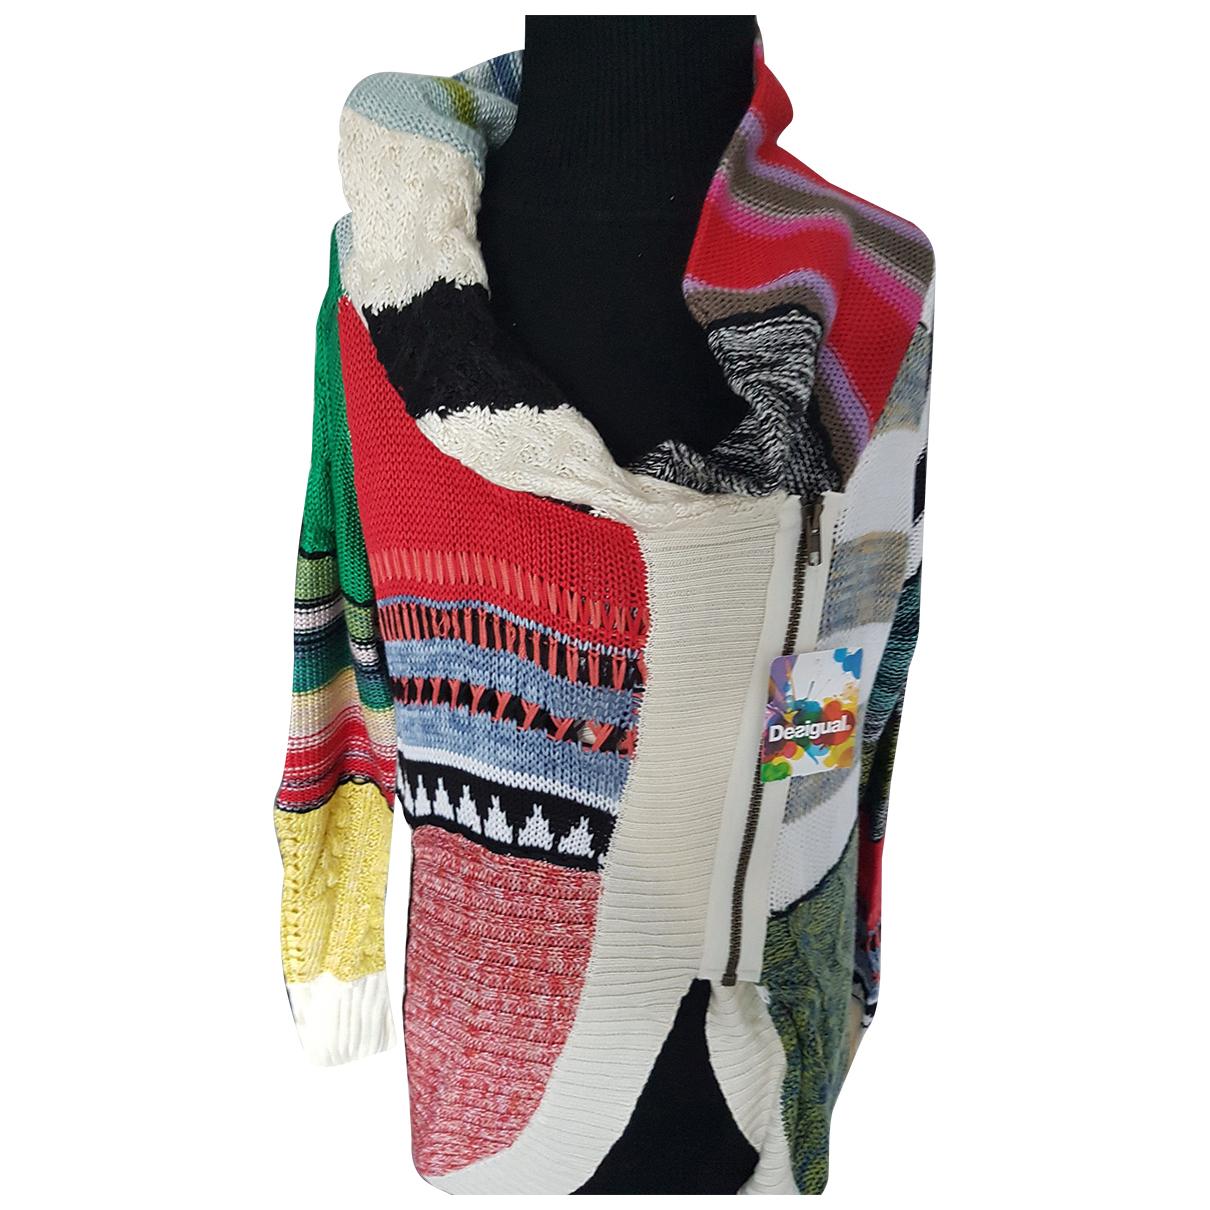 Desigual - Pull   pour femme - multicolore